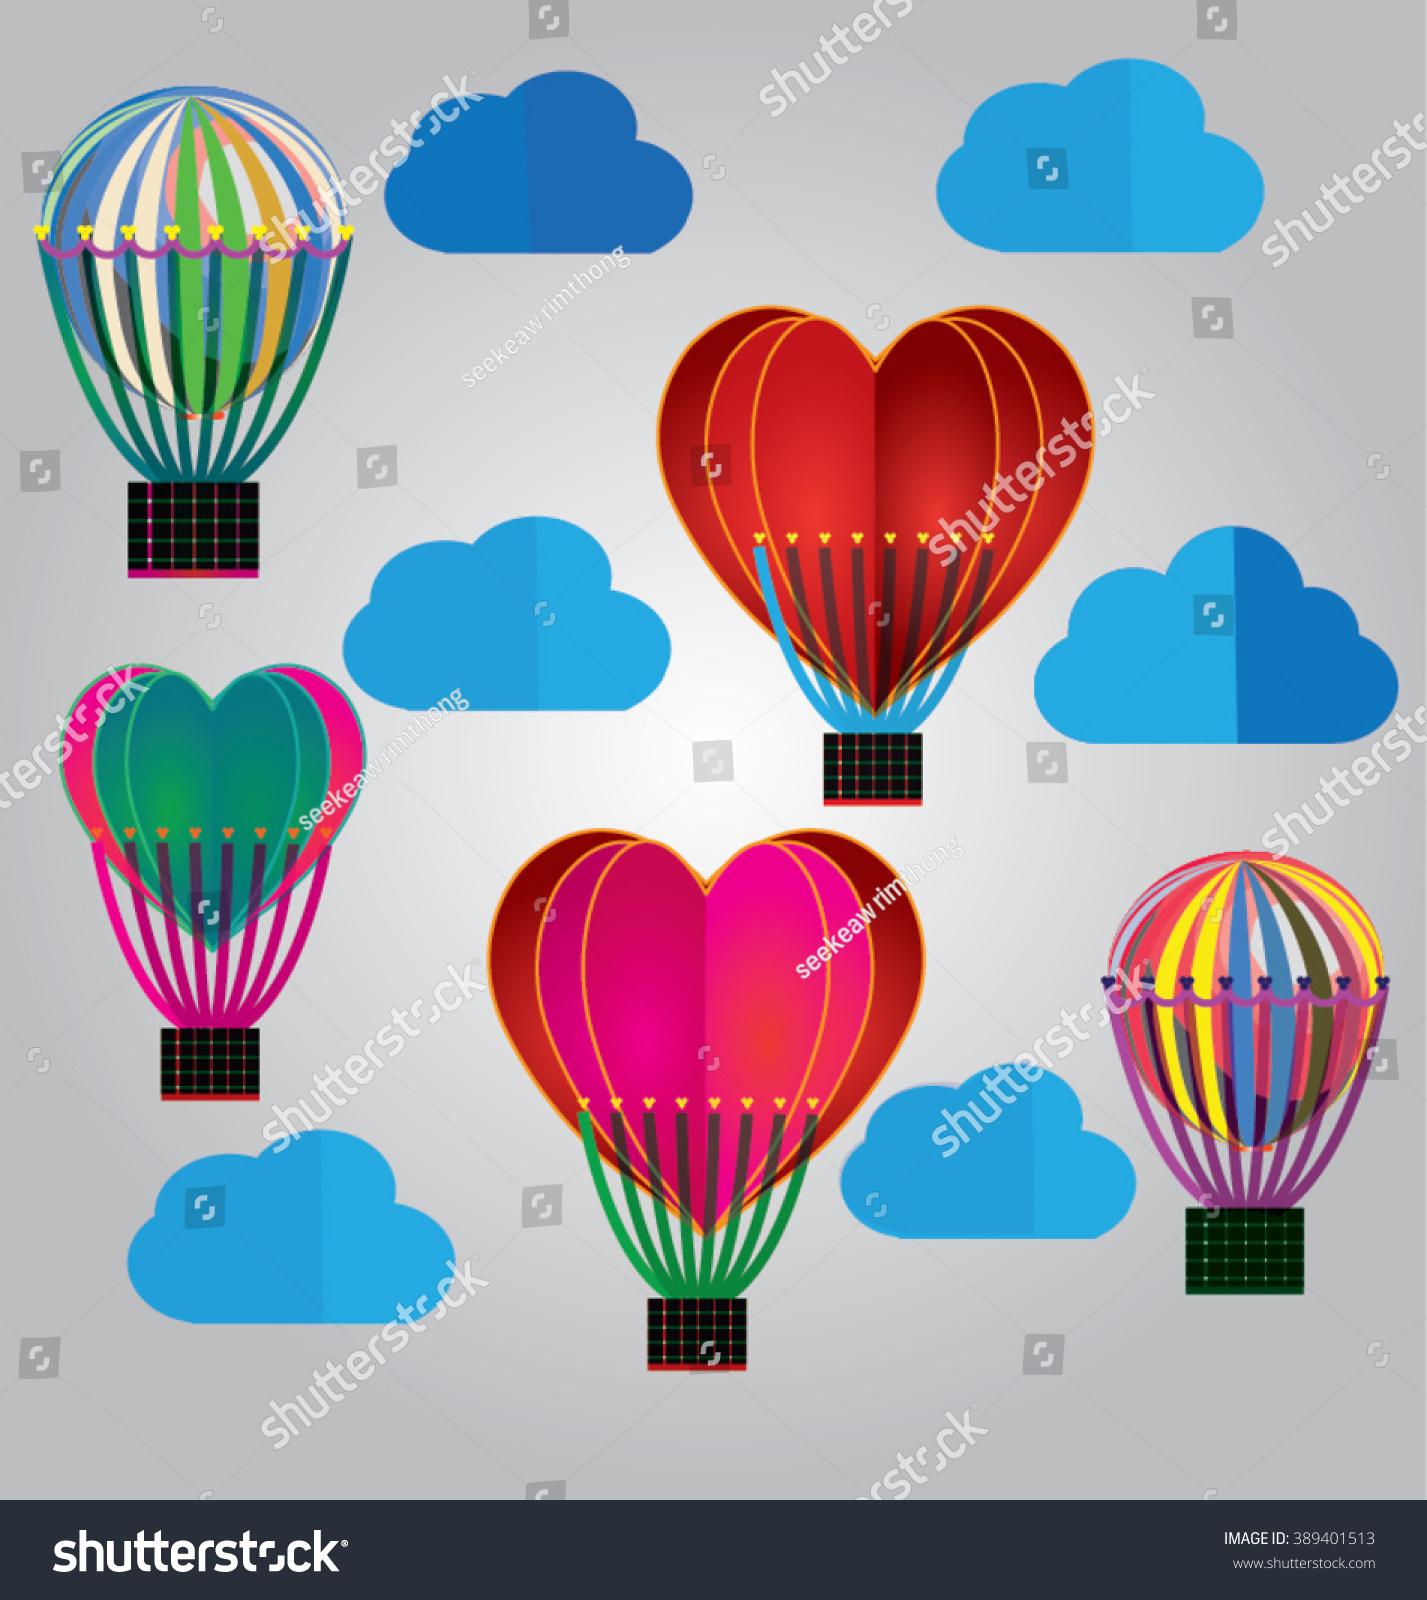 Origami made hot air balloon stock vector 389401513 shutterstock origami made hot air balloon jeuxipadfo Choice Image